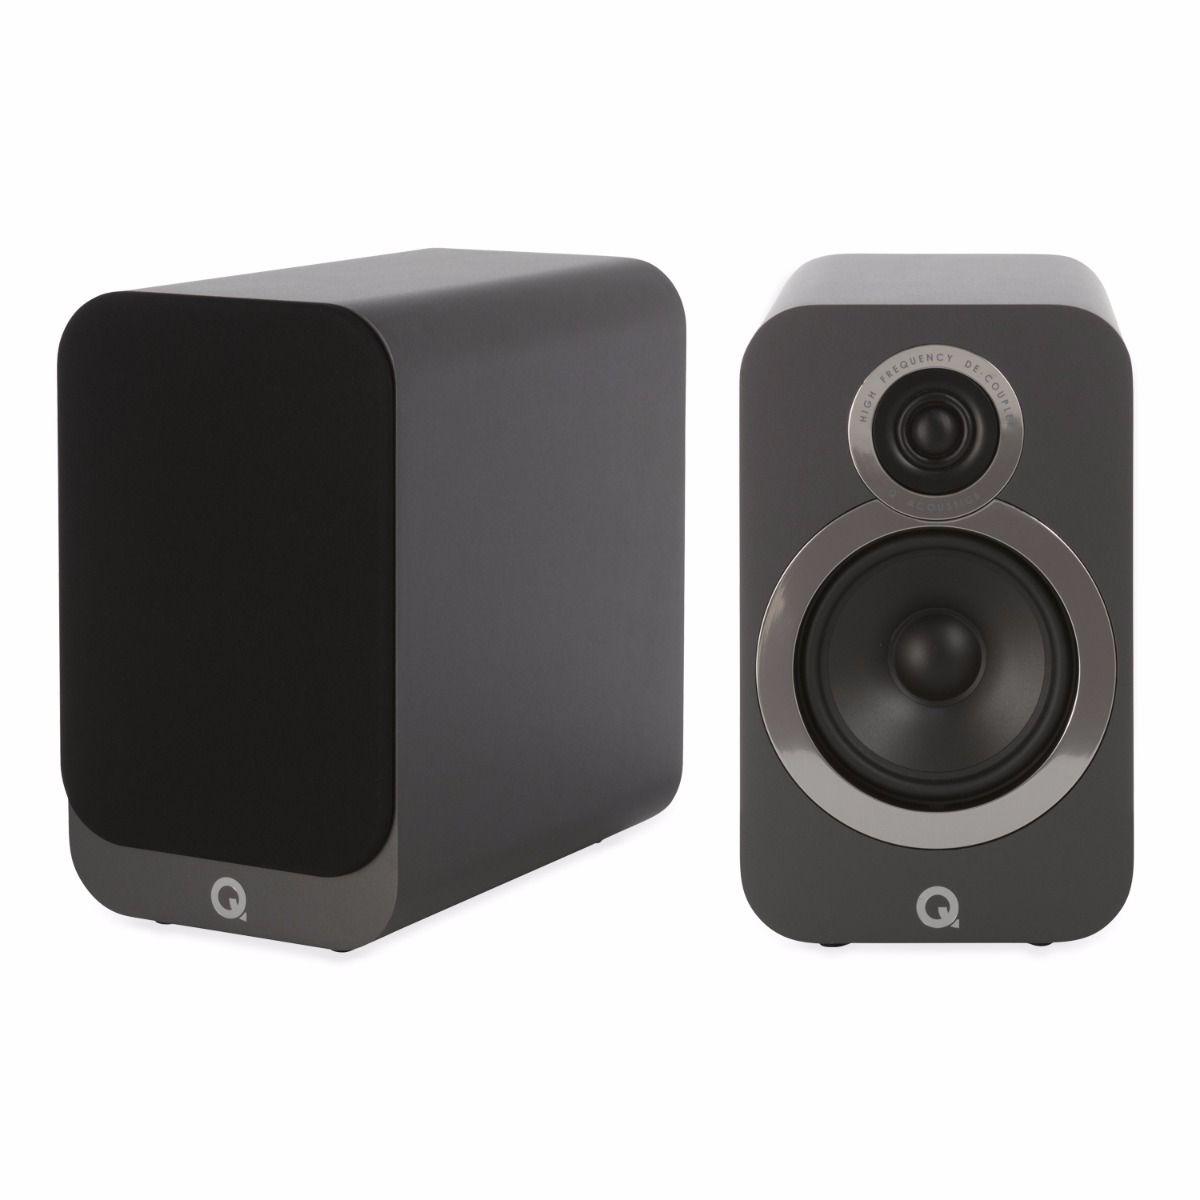 Q-Acoustics 3020i Compact Bookshelf Speaker